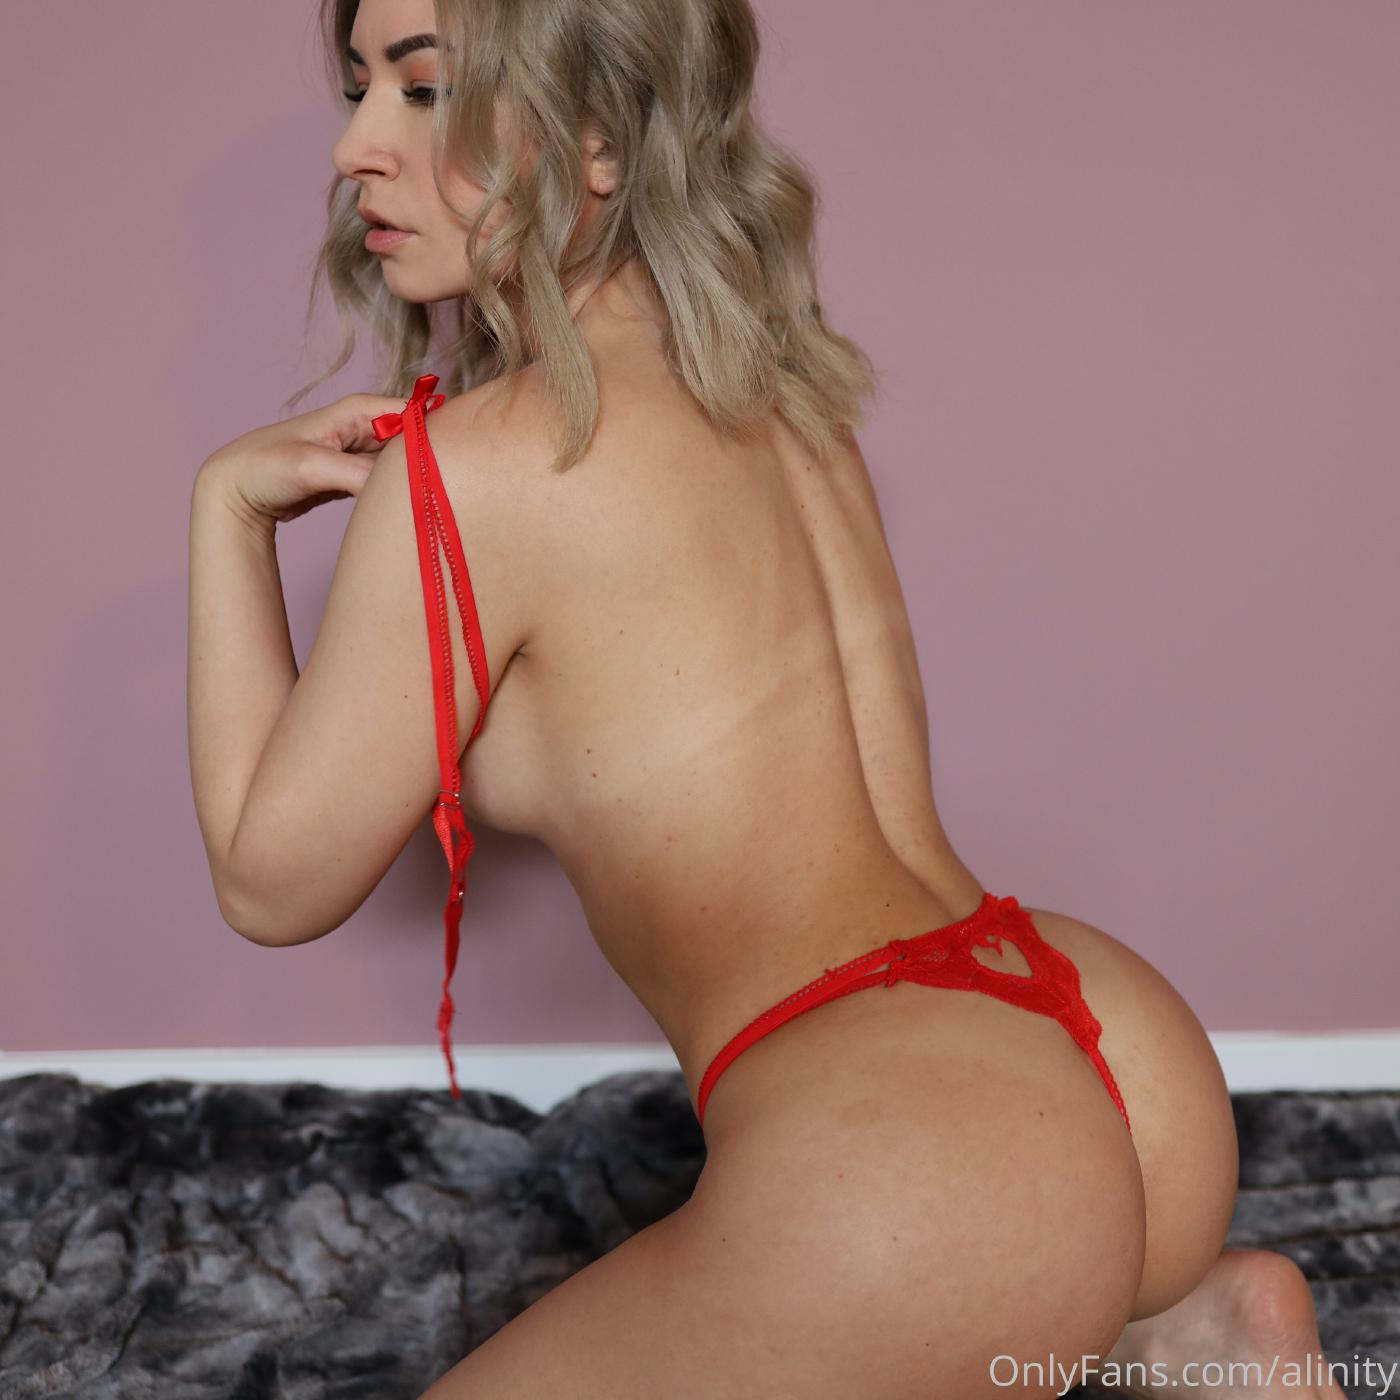 Alinity Nude Lingerie Onlyfans Set Leaked Mxrinp